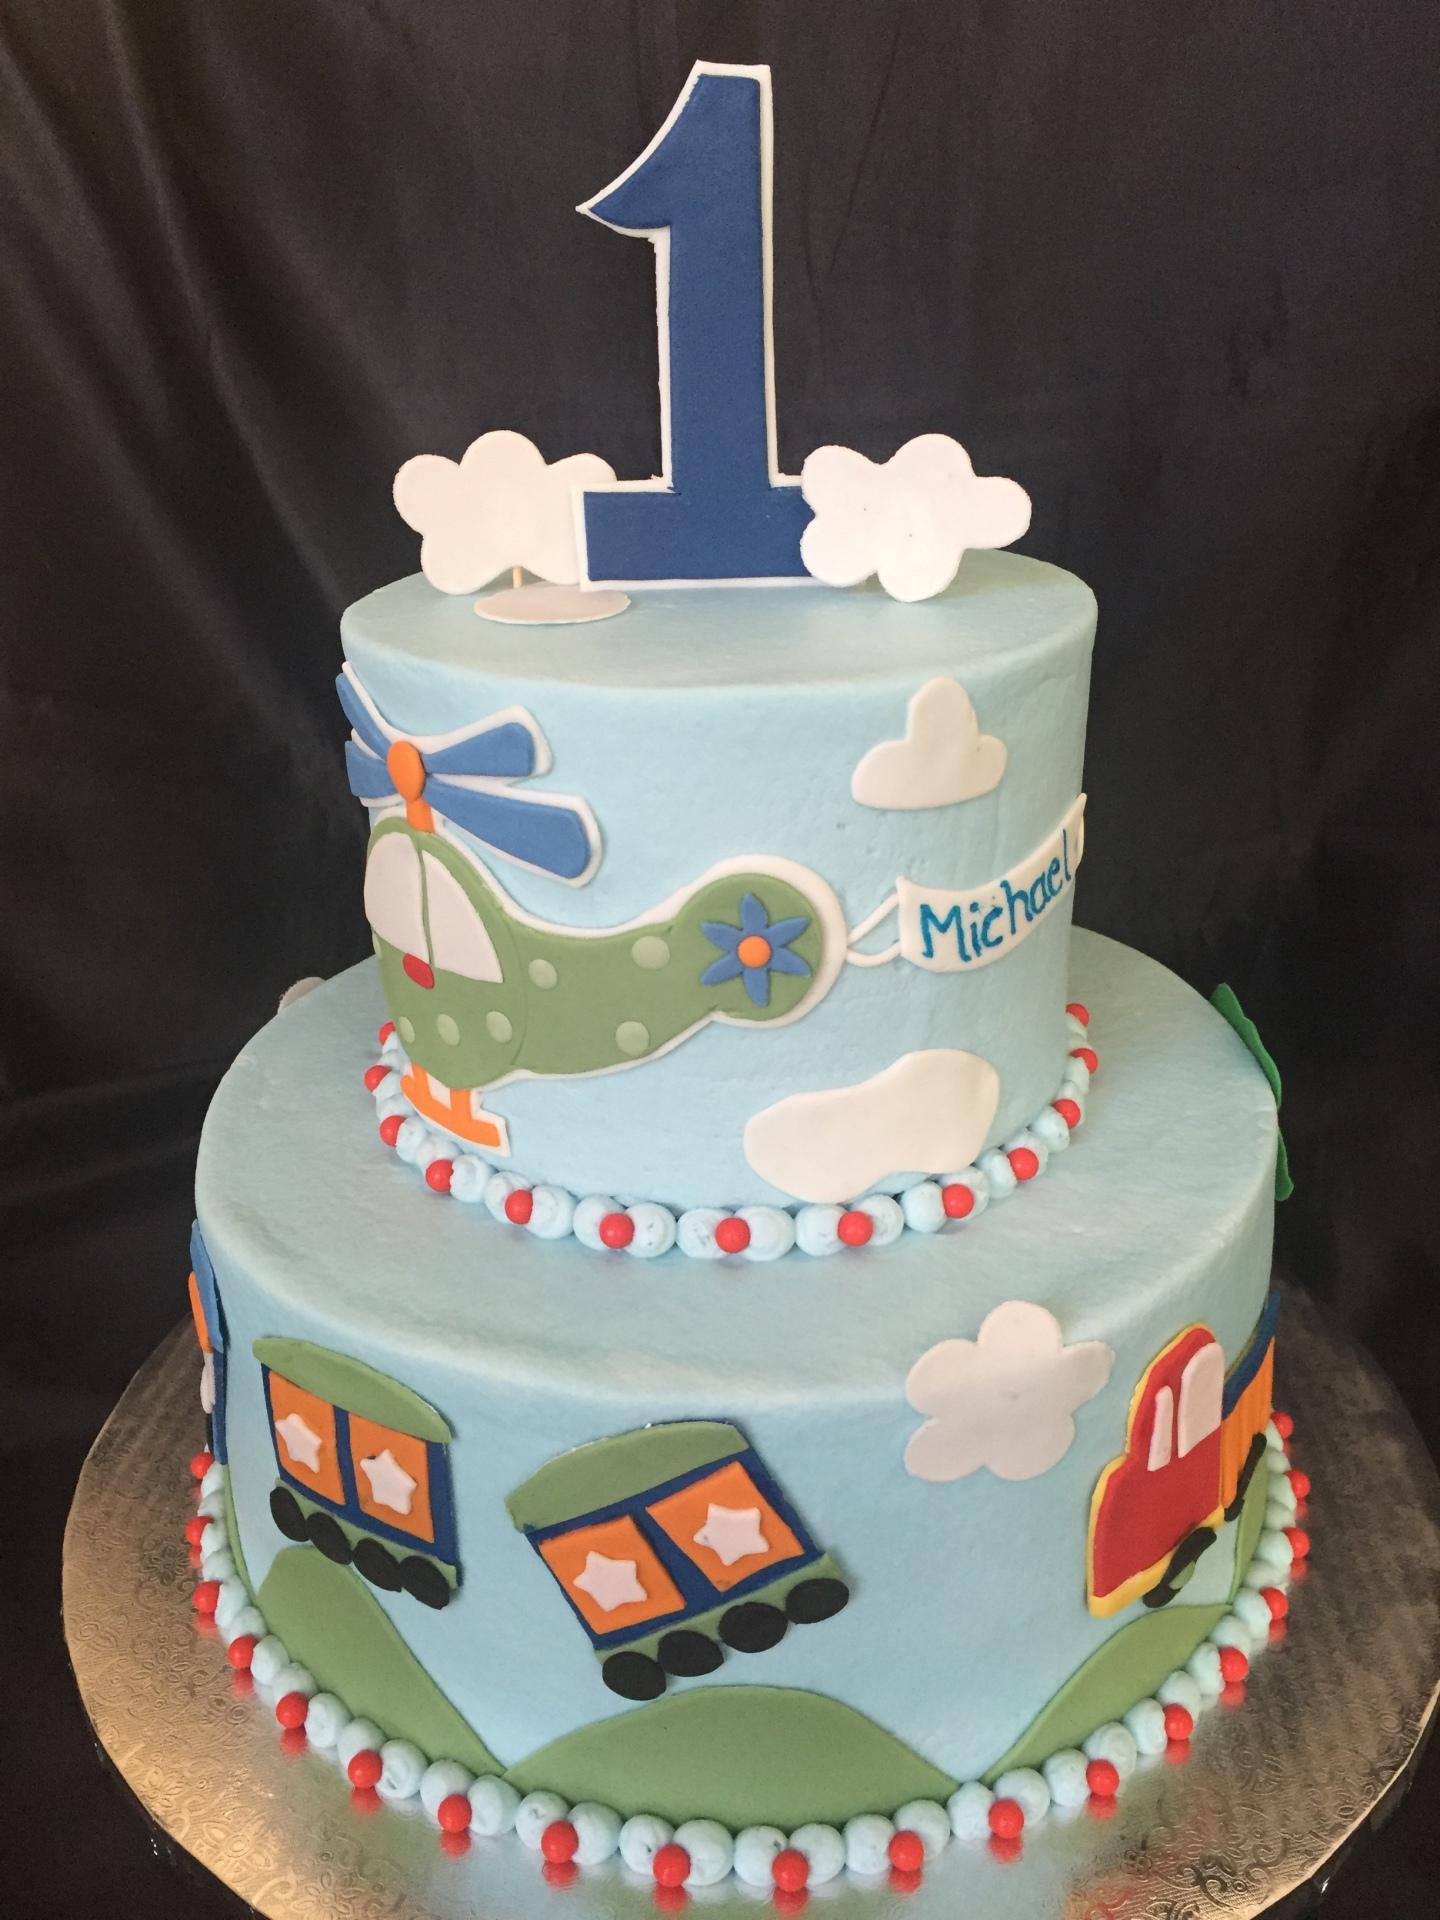 1st birthday cake, train cars plane cake